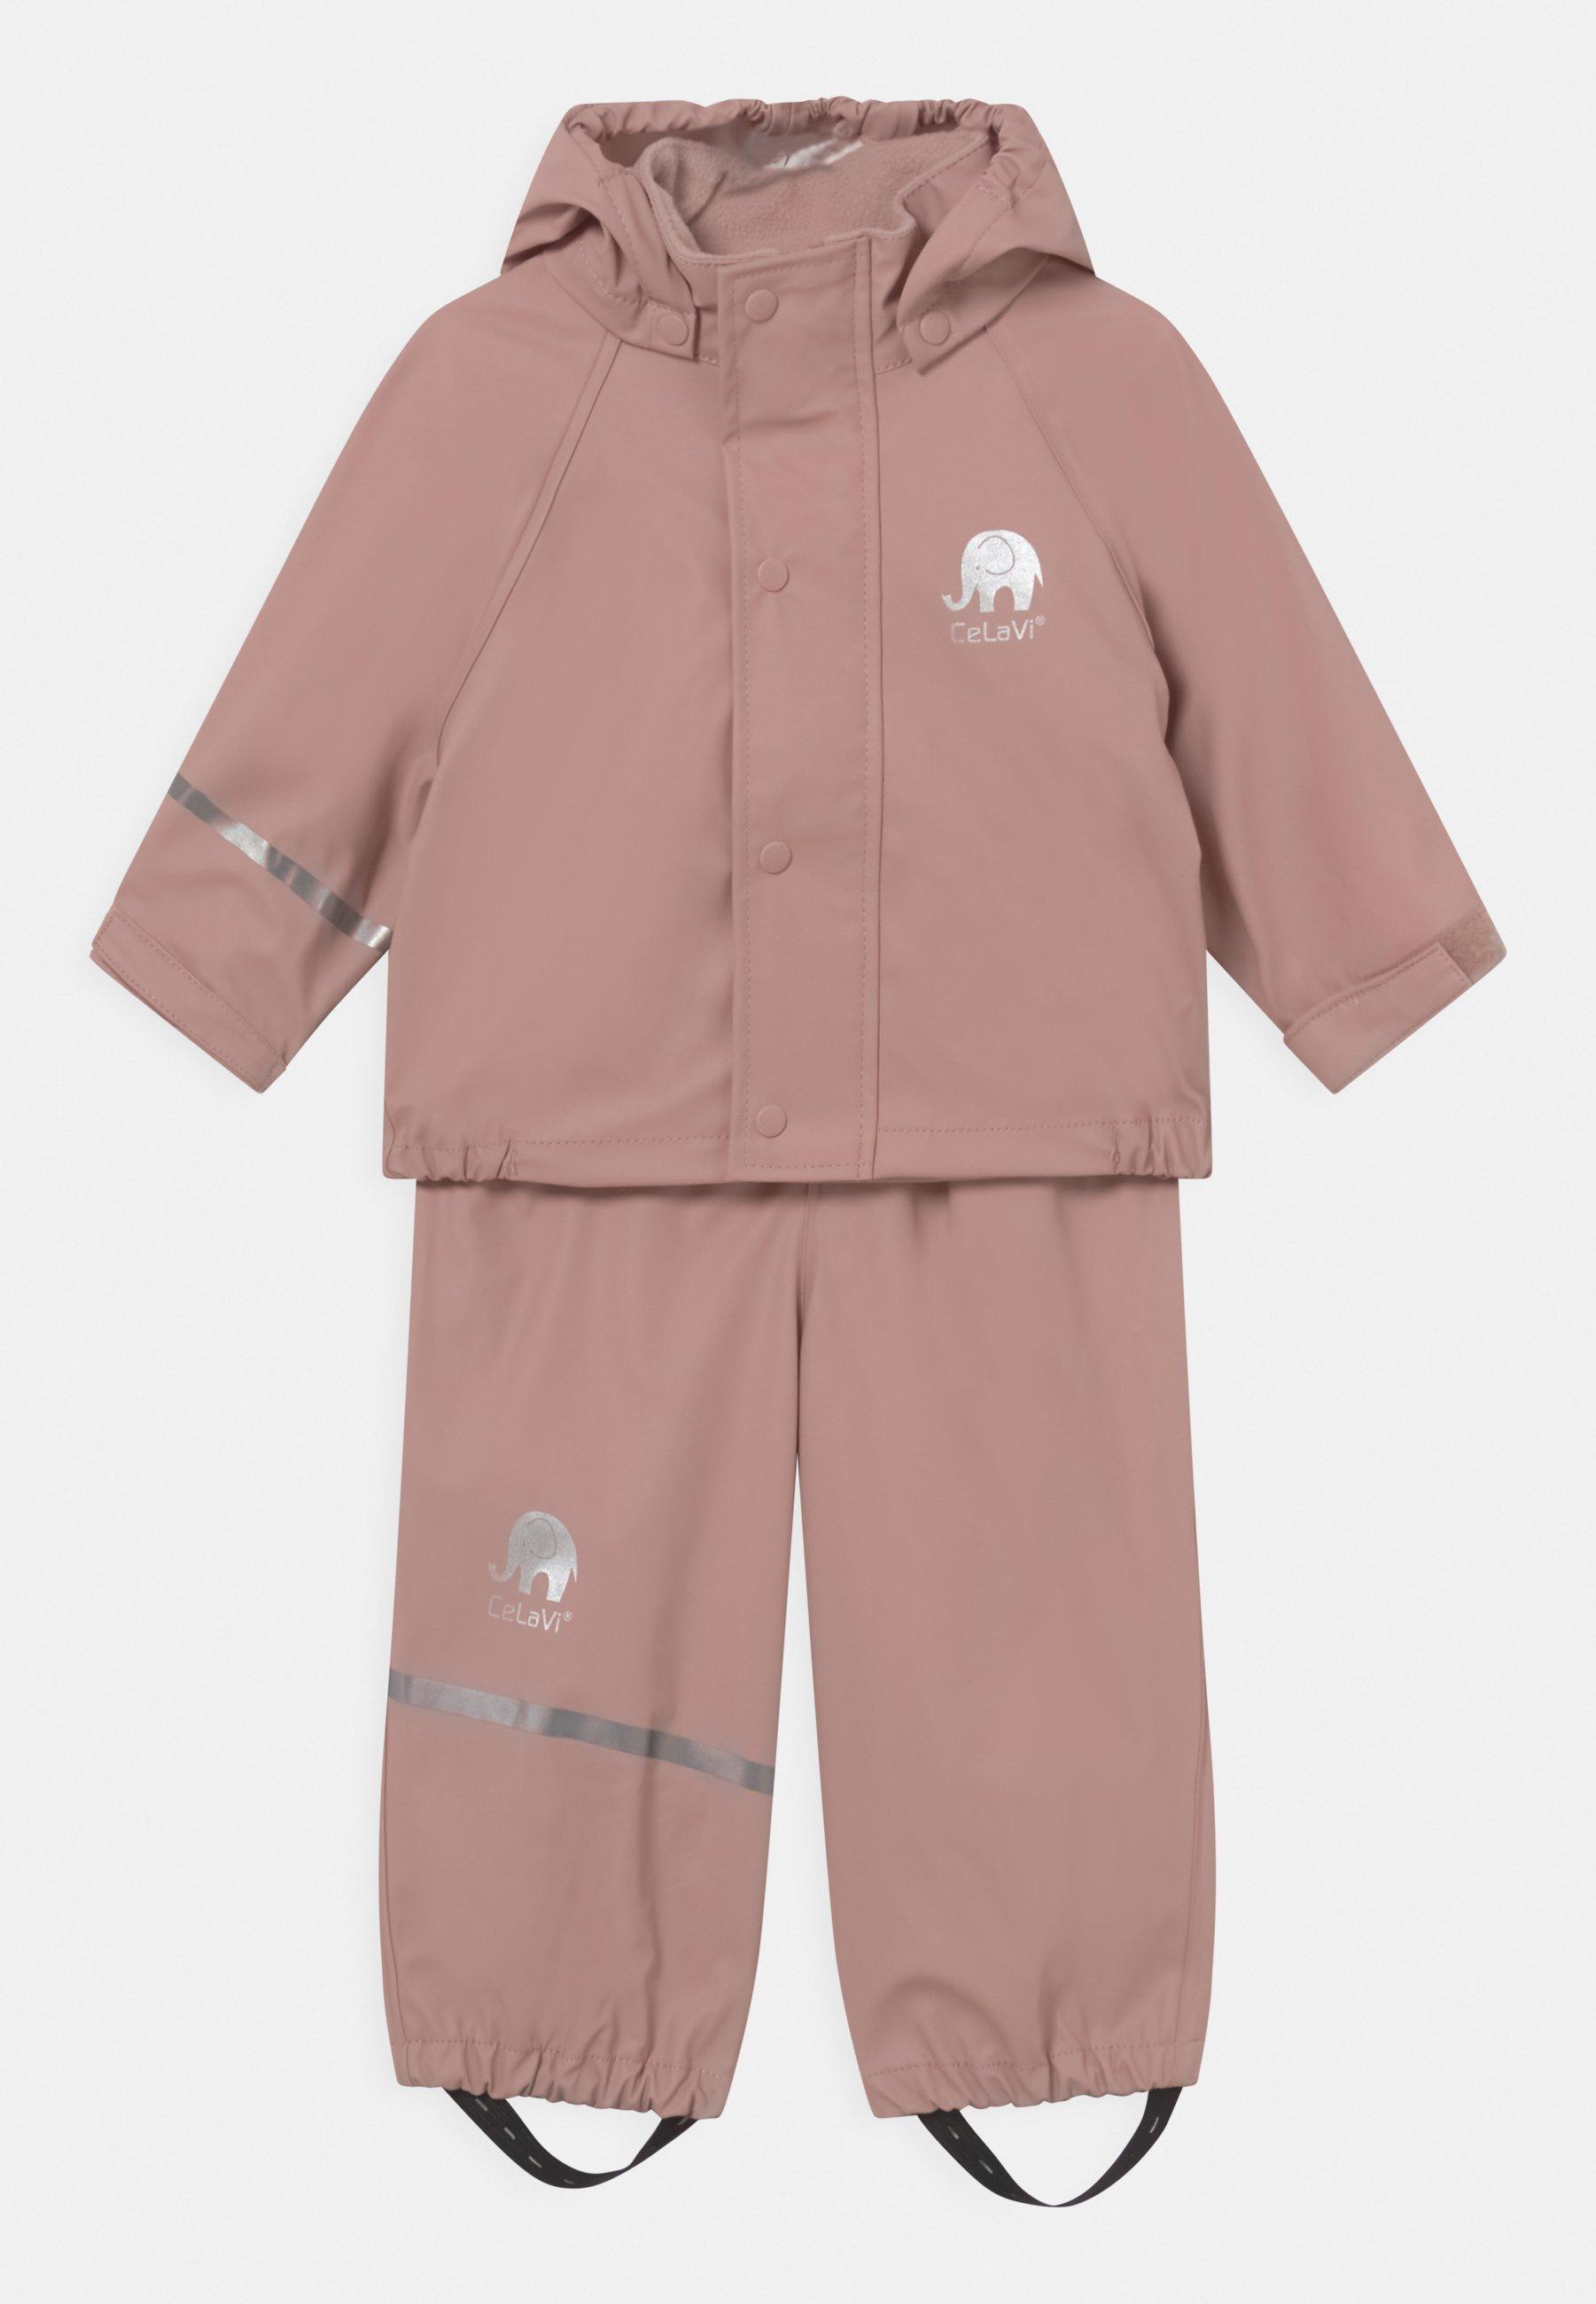 Kinder BASIC RAINWEAR SOLID SET UNISEX - Regenjacke / wasserabweisende Jacke